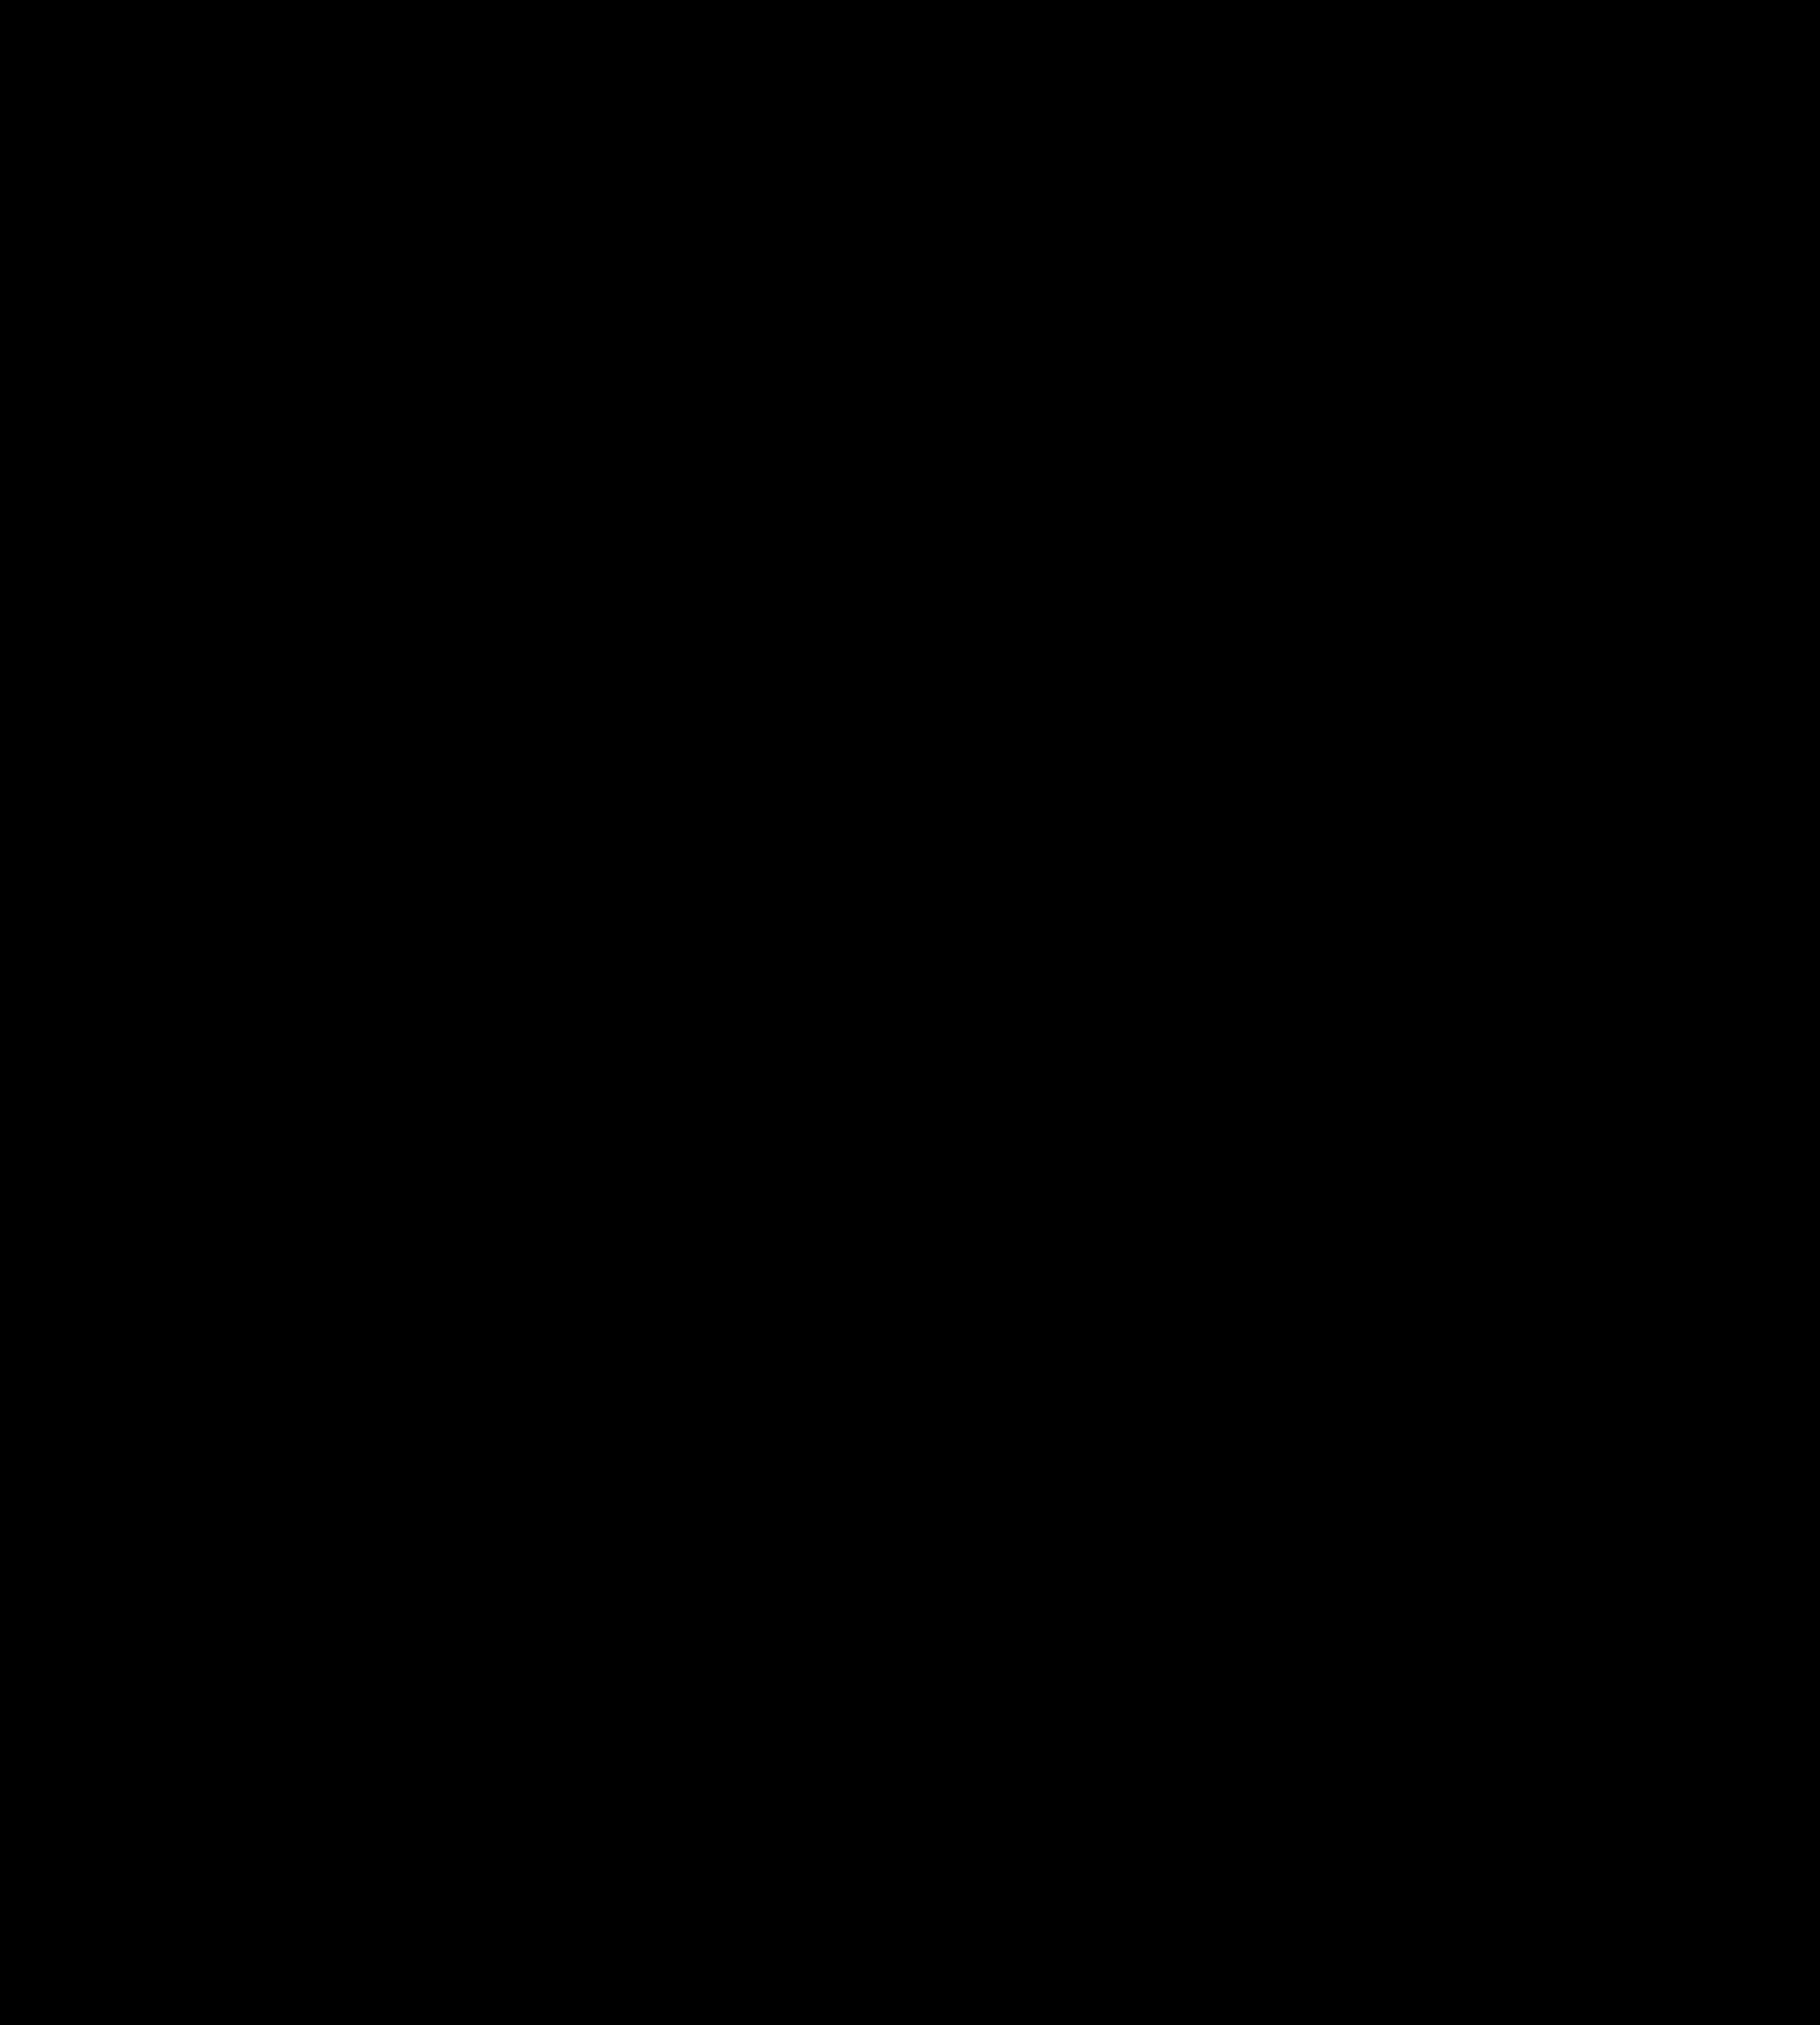 sketch of custom schulz pullover